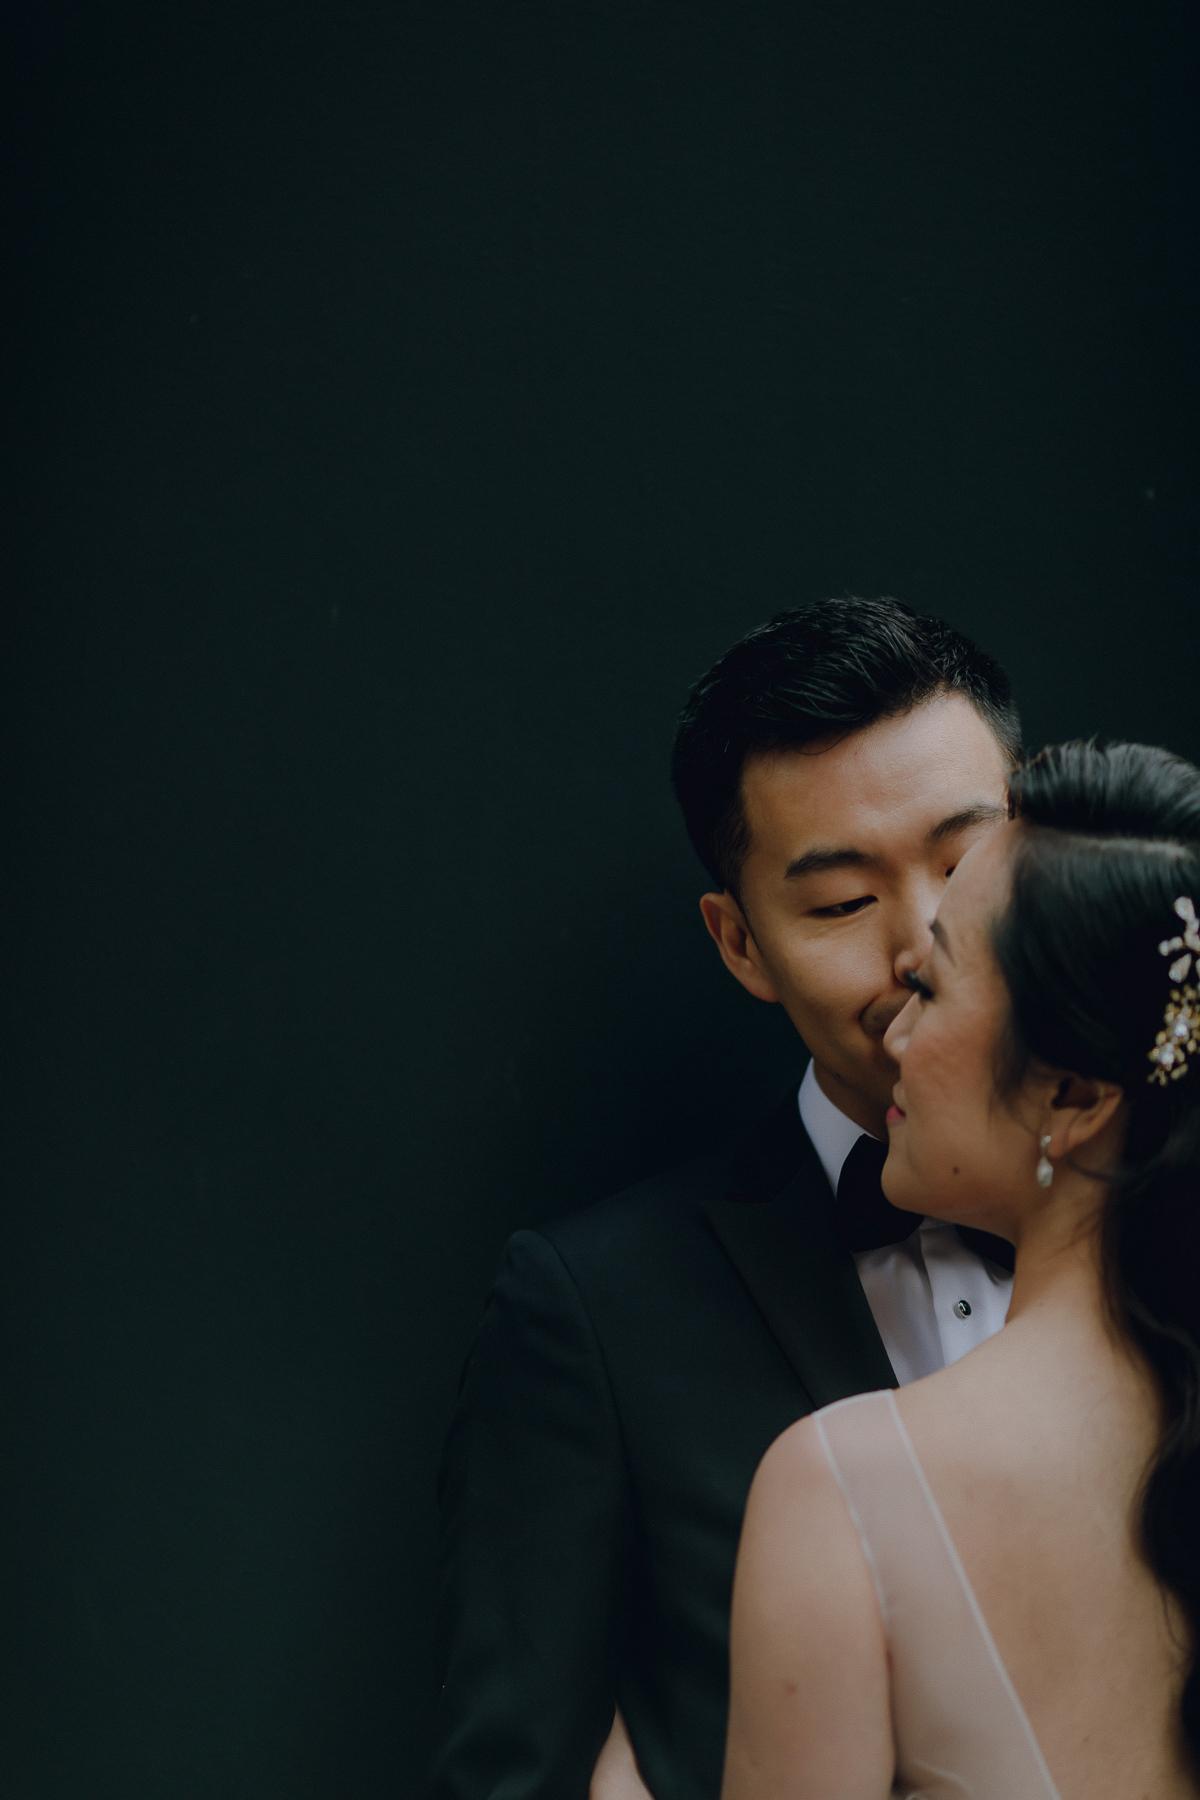 cannoe-restaurannt-wedding 0026.jpg